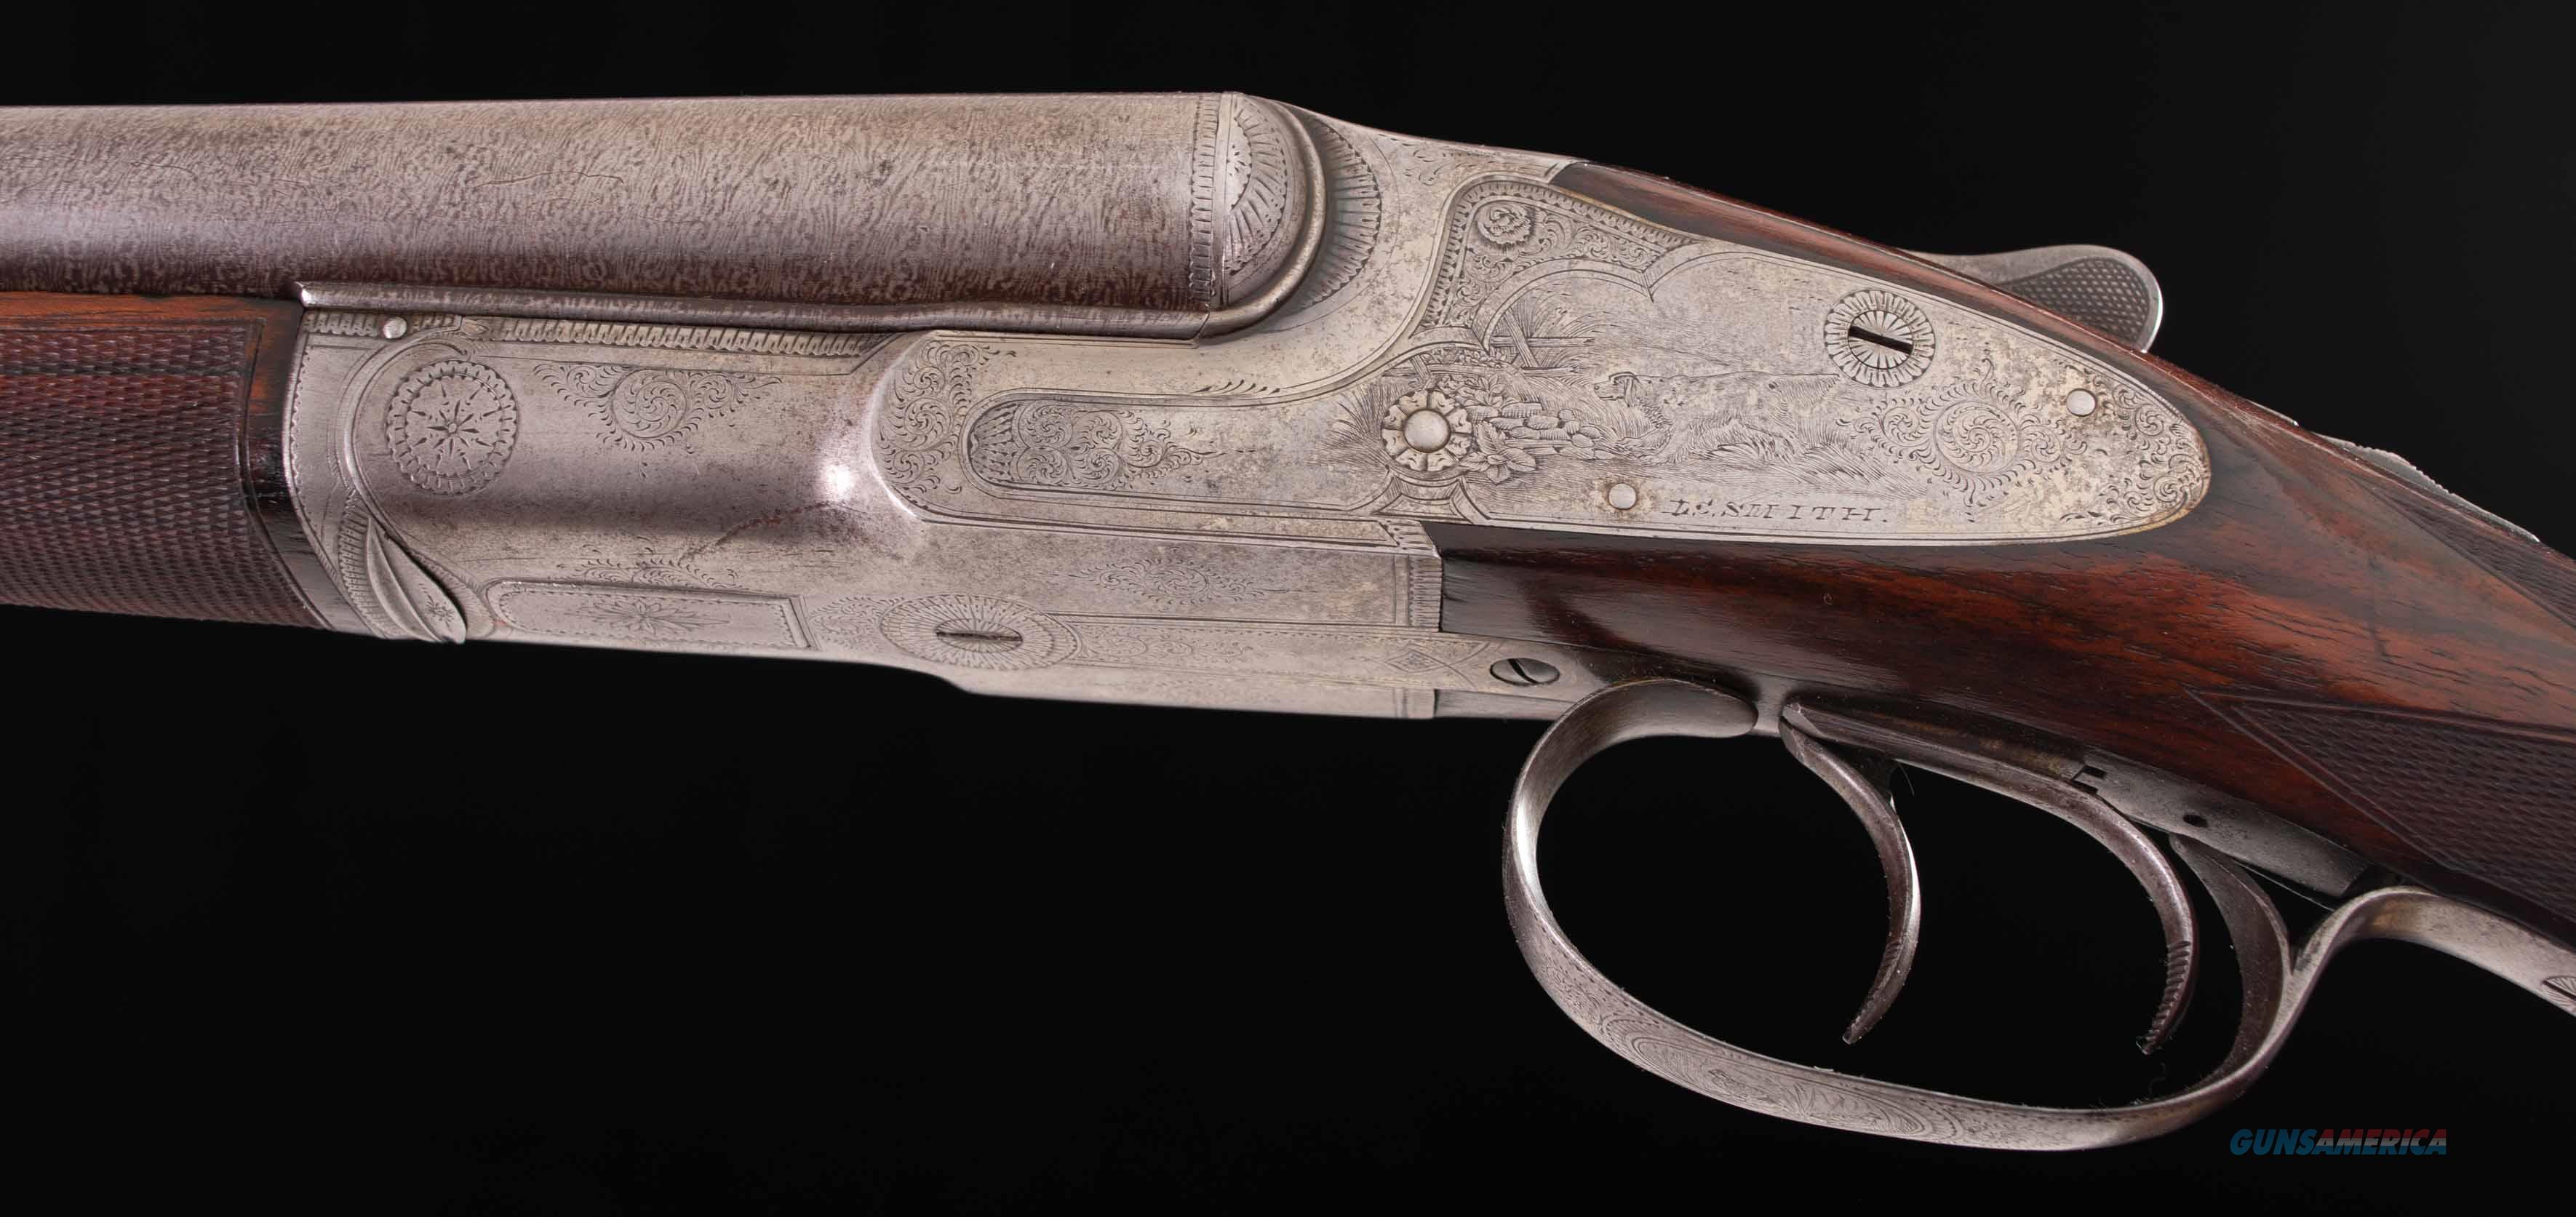 "L.C. Smith Quality A-1 - vintage firearms - RARE 16 Gauge, 1 OF 10 MADE, FIGURED ENGLISH WALNUT, 28"" DAMASCUS  Guns > Shotguns > L.C. Smith Shotguns"